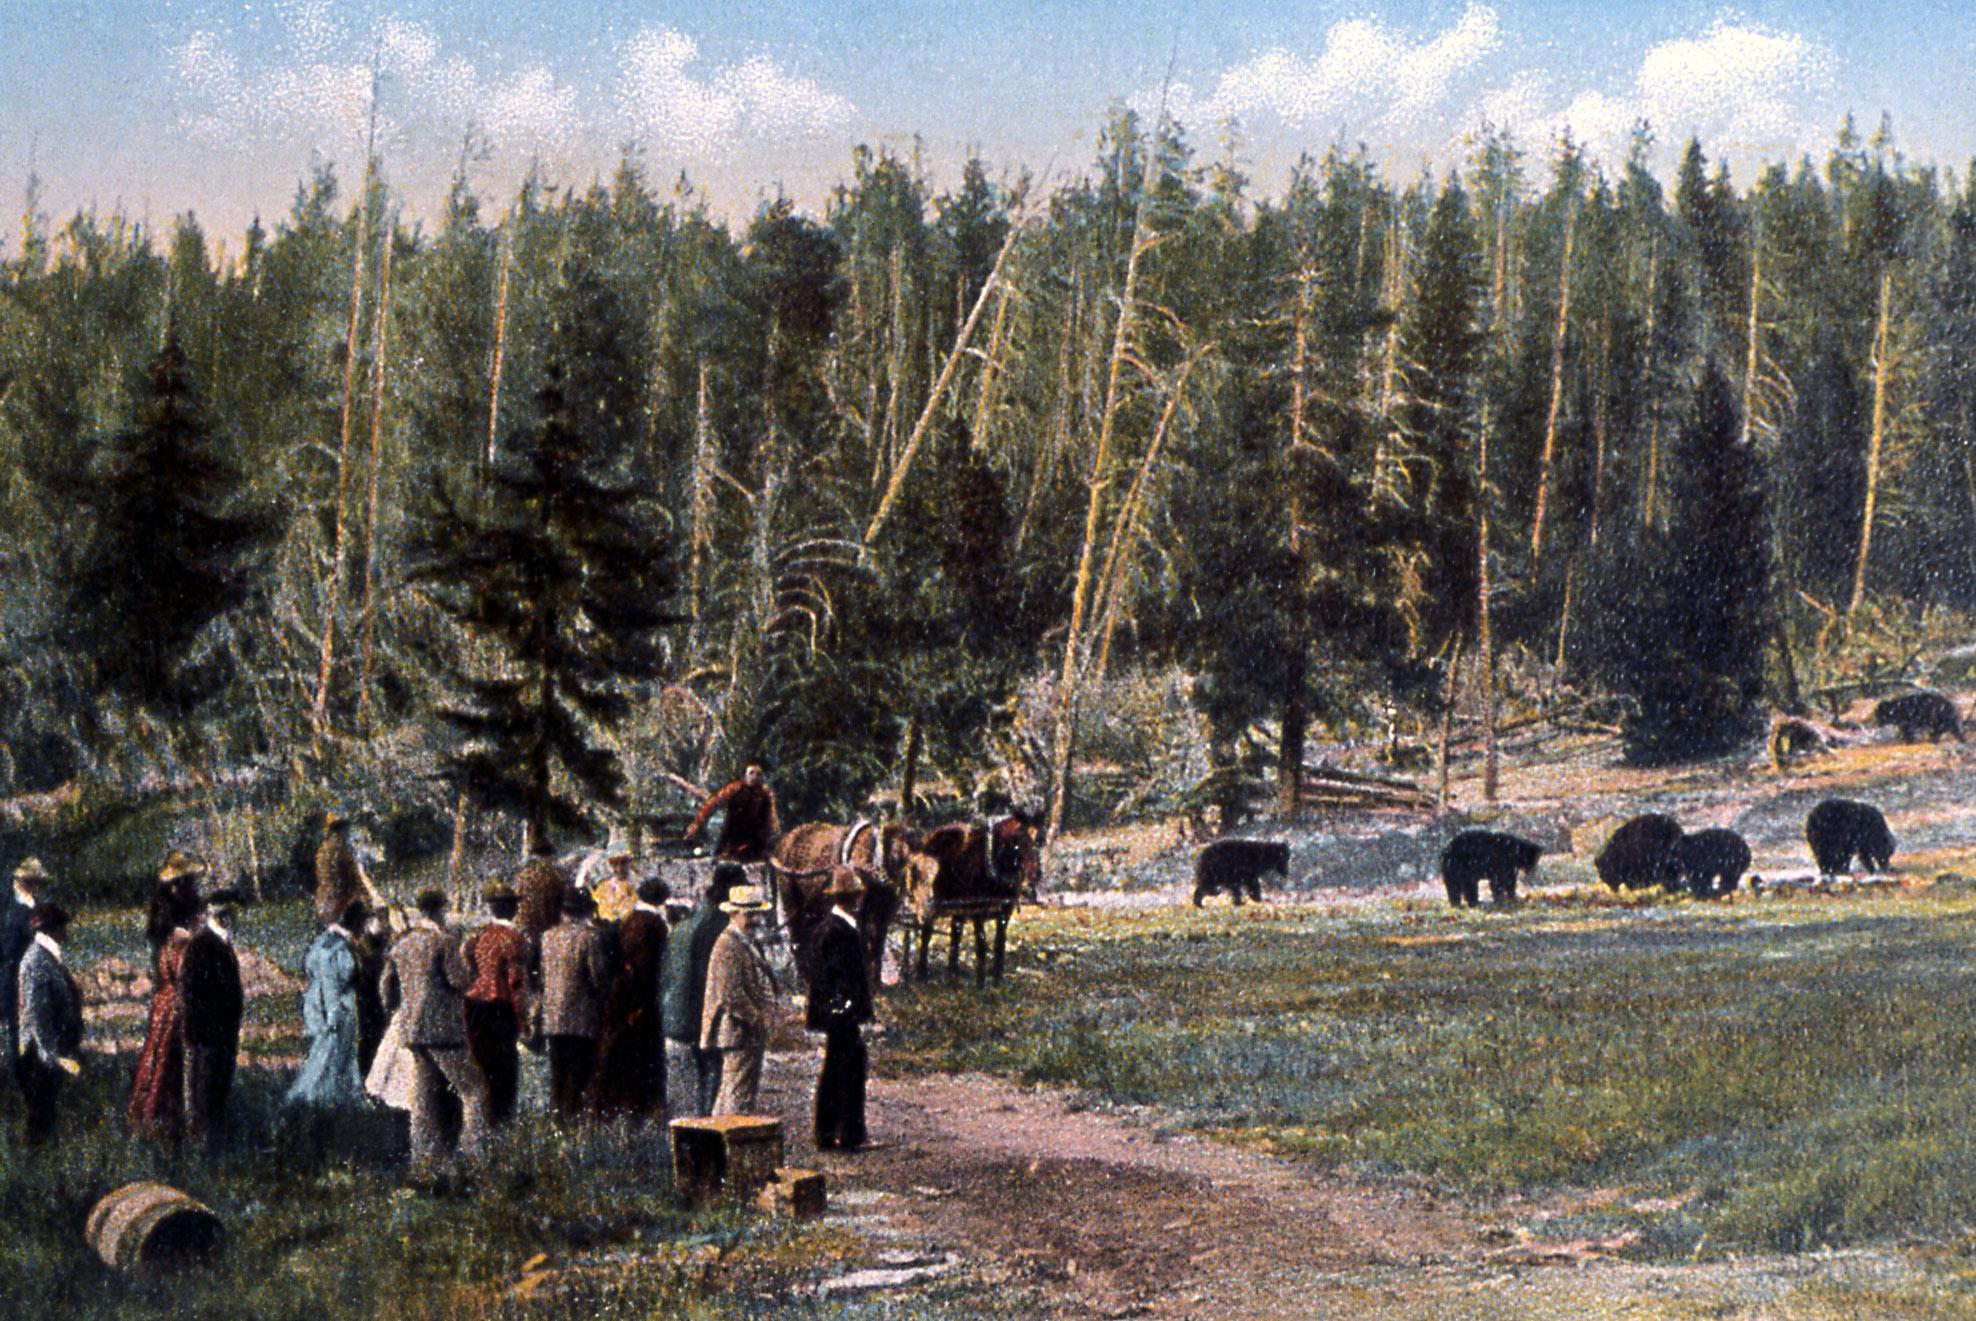 Postcard of the bear feedings Photo: nps